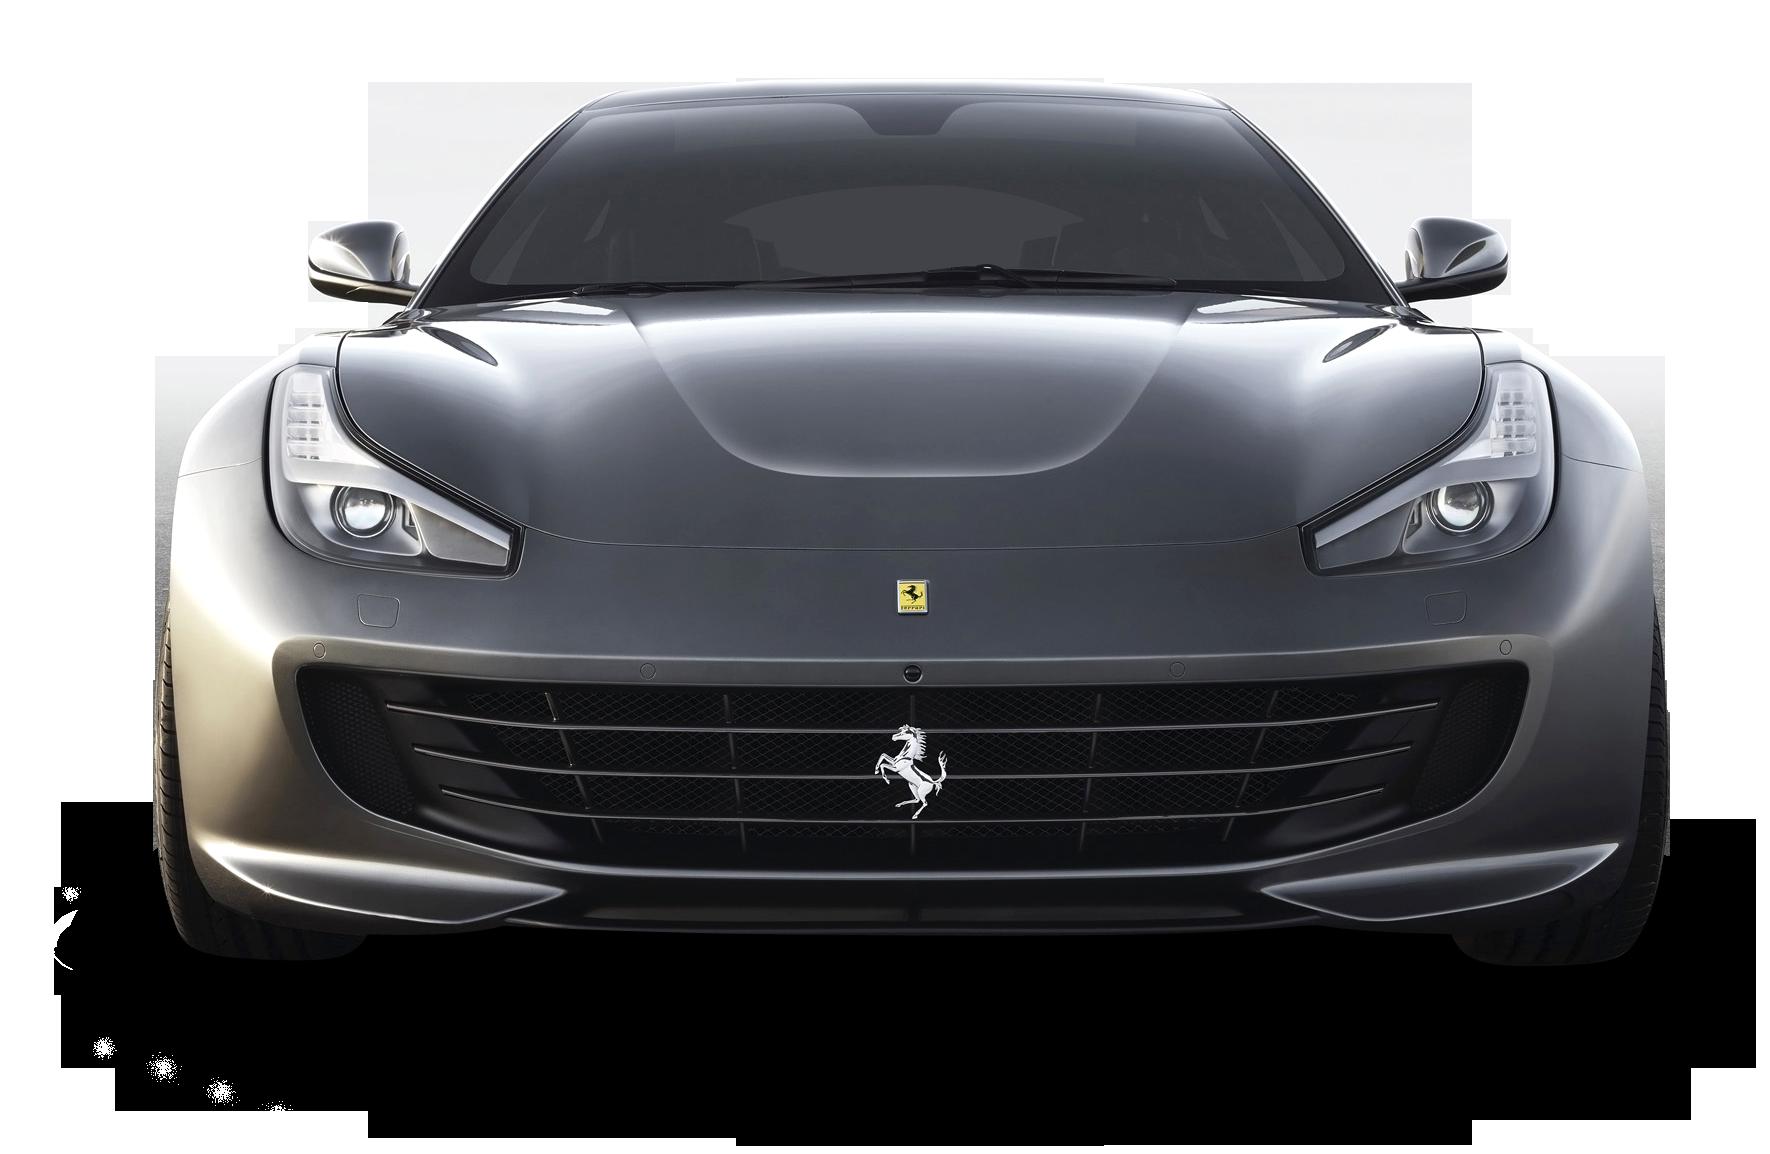 Ferrari GTC4 Lusso Front Gray Car